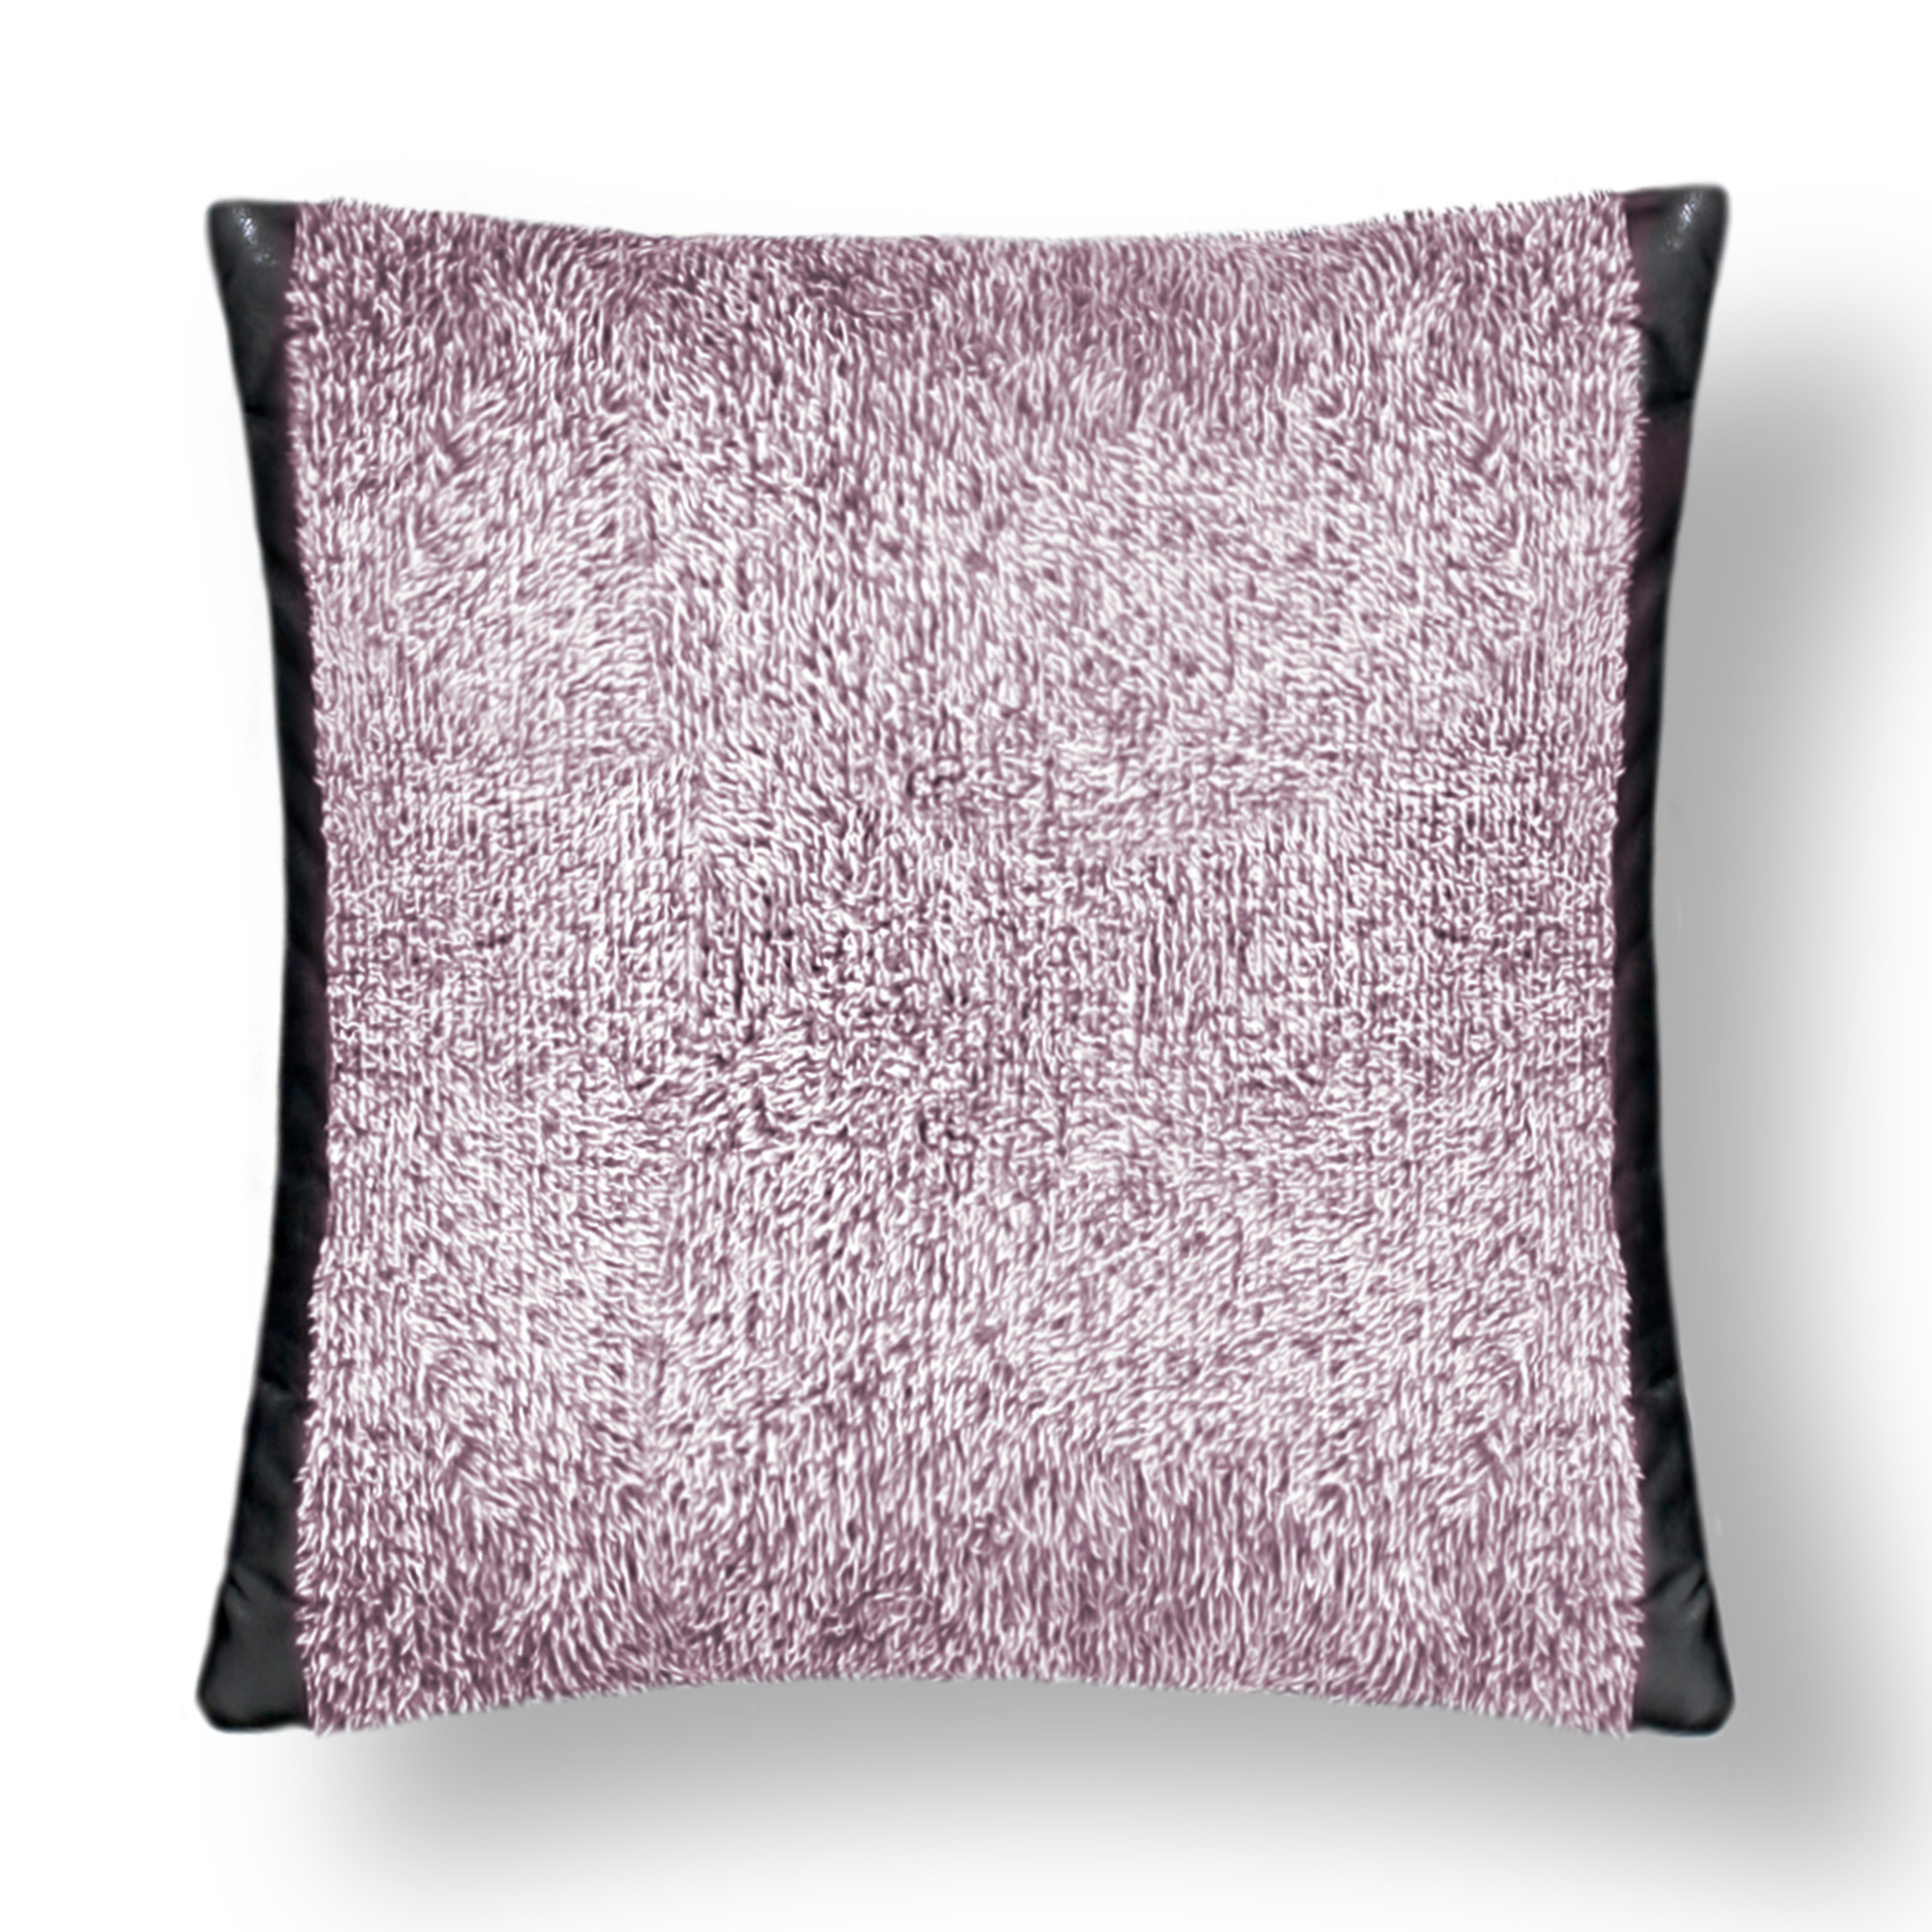 crush zoeppritz since 1828. Black Bedroom Furniture Sets. Home Design Ideas